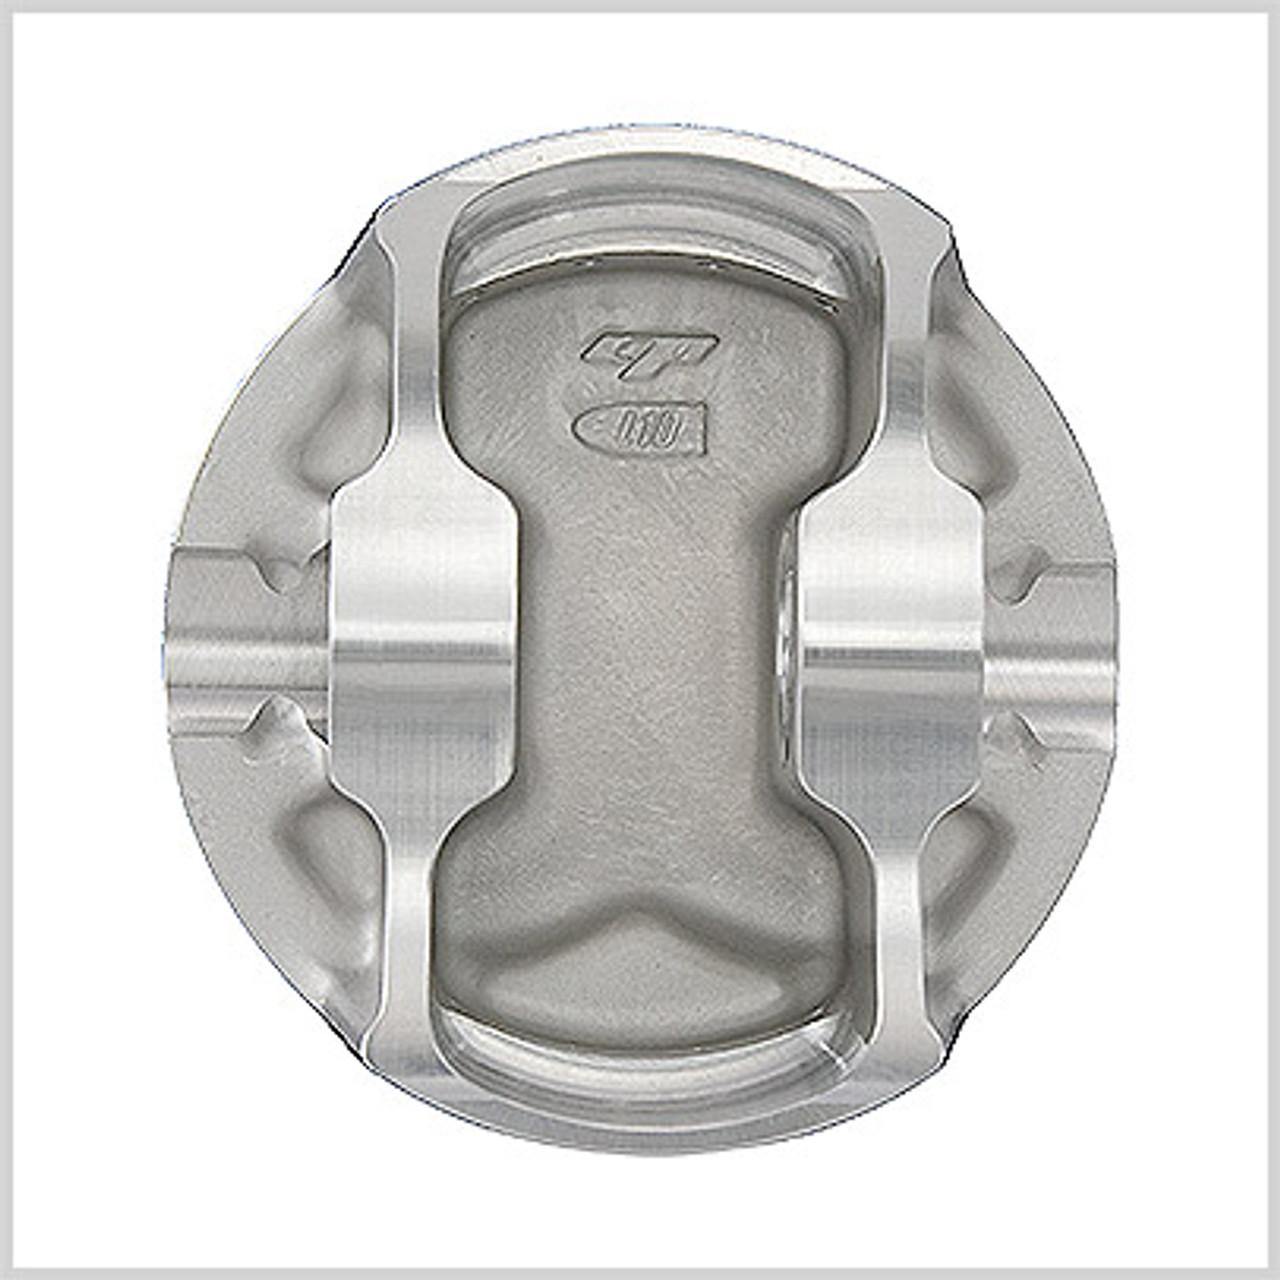 "Carillo CP Bullet LS 4.065"" Pistons Set | 4.00"" Stroke -27.4cc Dish Top | POWER ADDER"